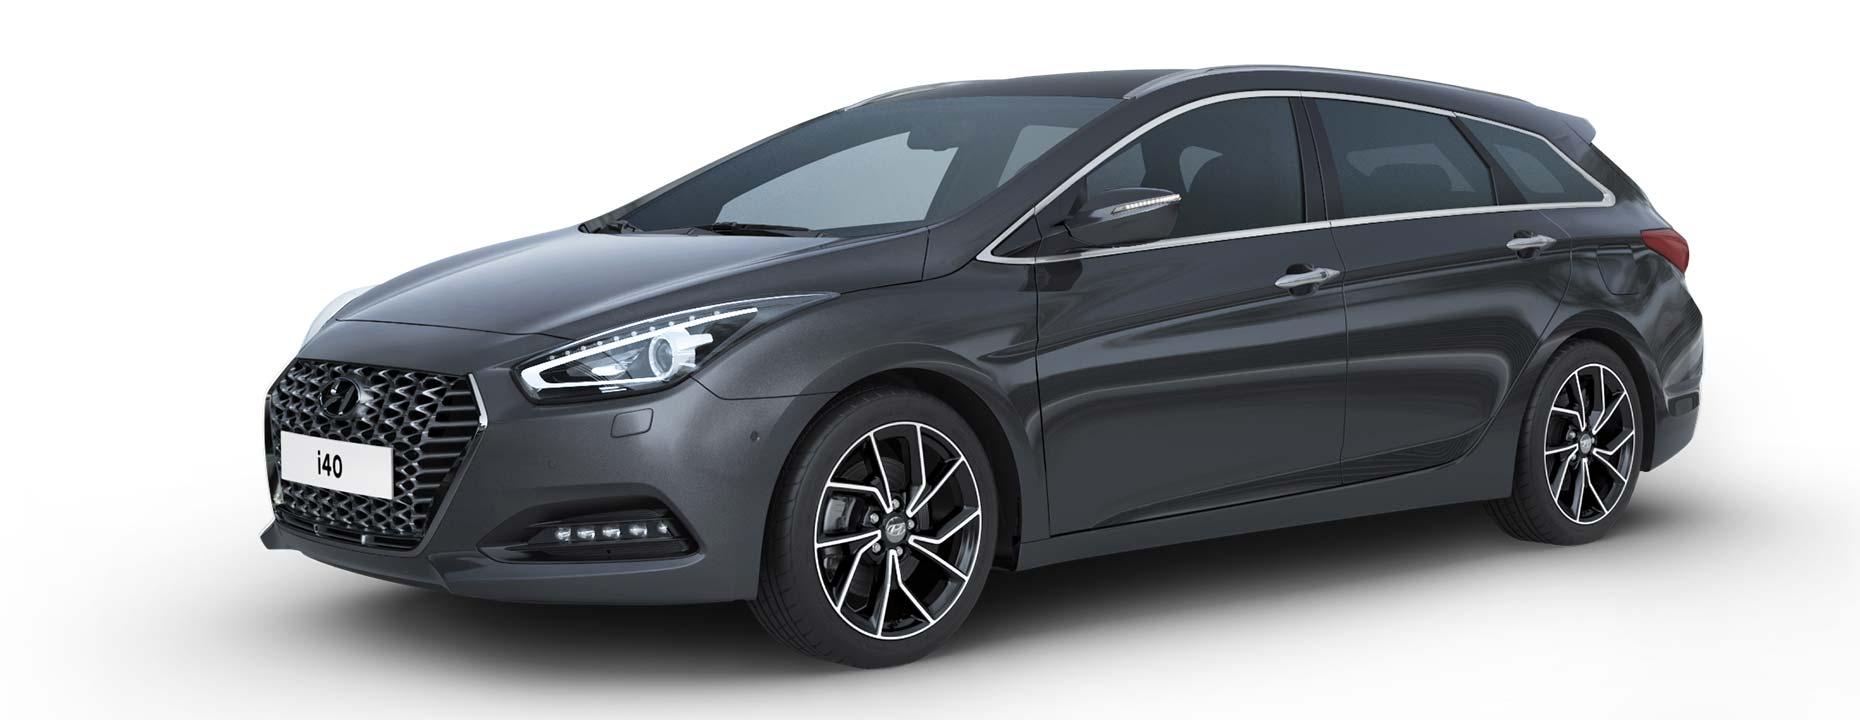 Hyundai i40 - Moderan dizajn